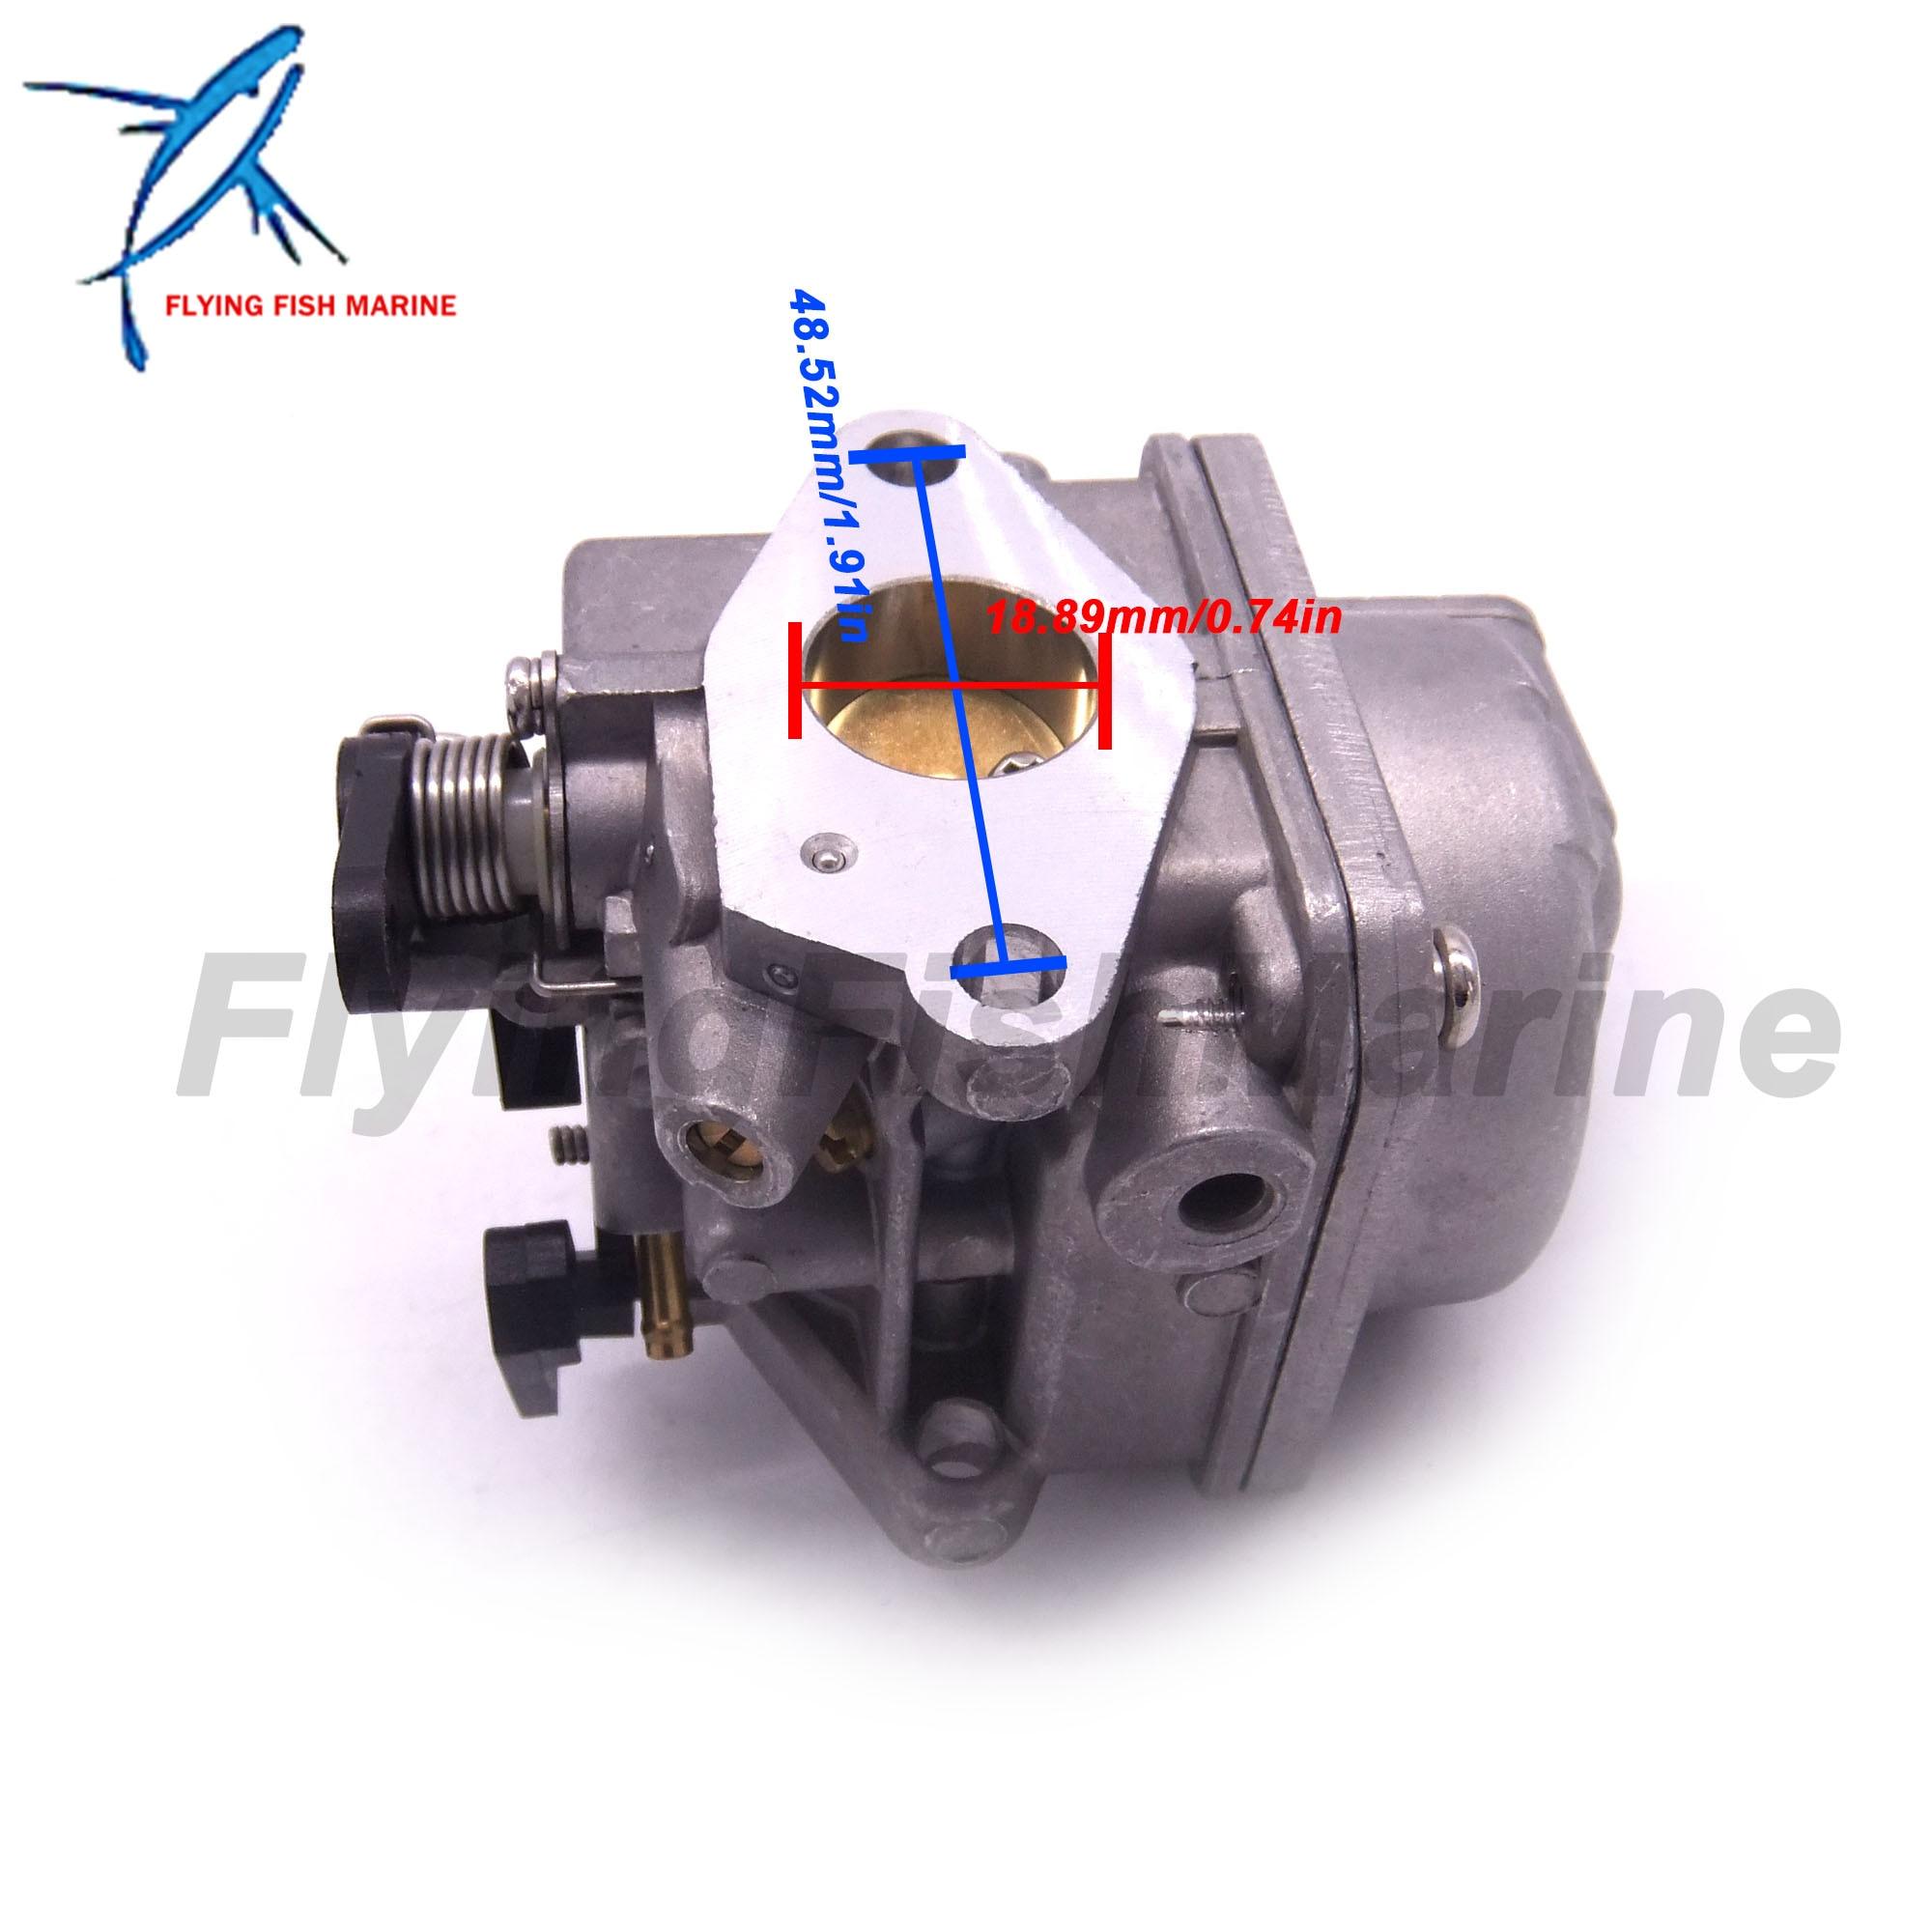 Image 5 - 3JE 03200 0 3JE032000 3JE032000M Outboard Motor Carburetor Assy  for Tohatsu Nissan 4 stroke 6HP MFS6C NFS6C Boat EngineBoat Engine   -